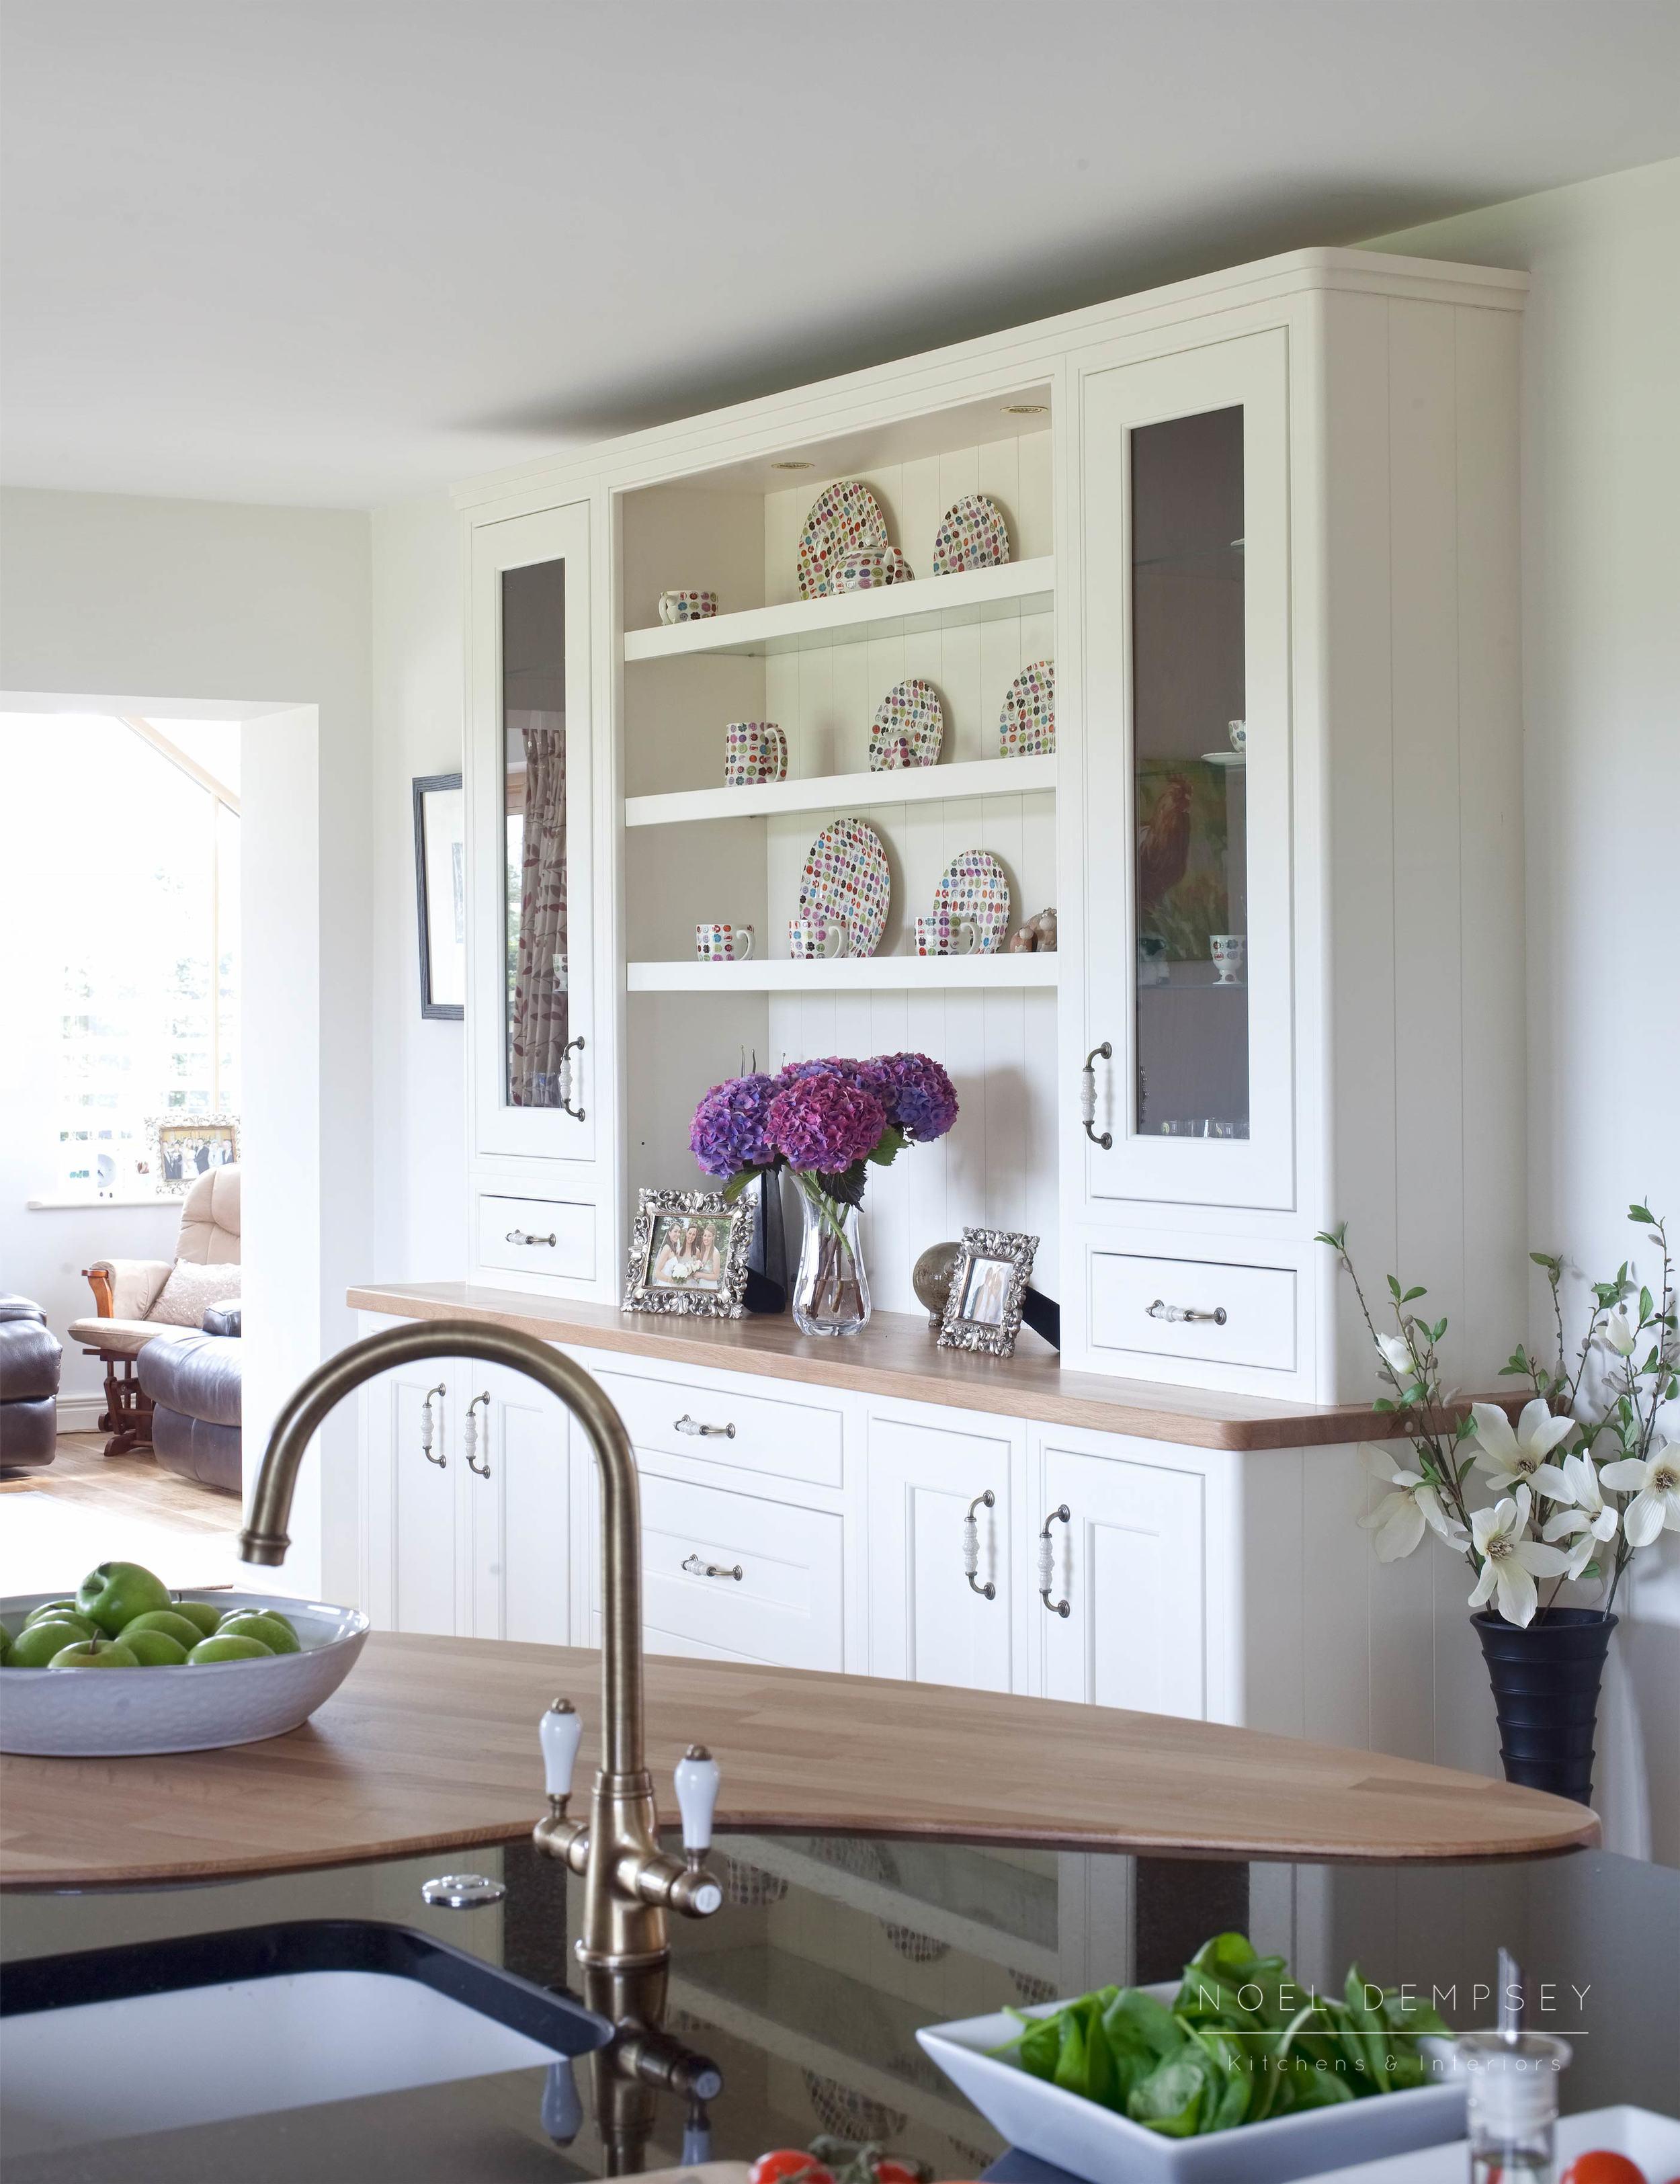 Fox-lane-inframe-hand-painted-kitchens-5.jpg